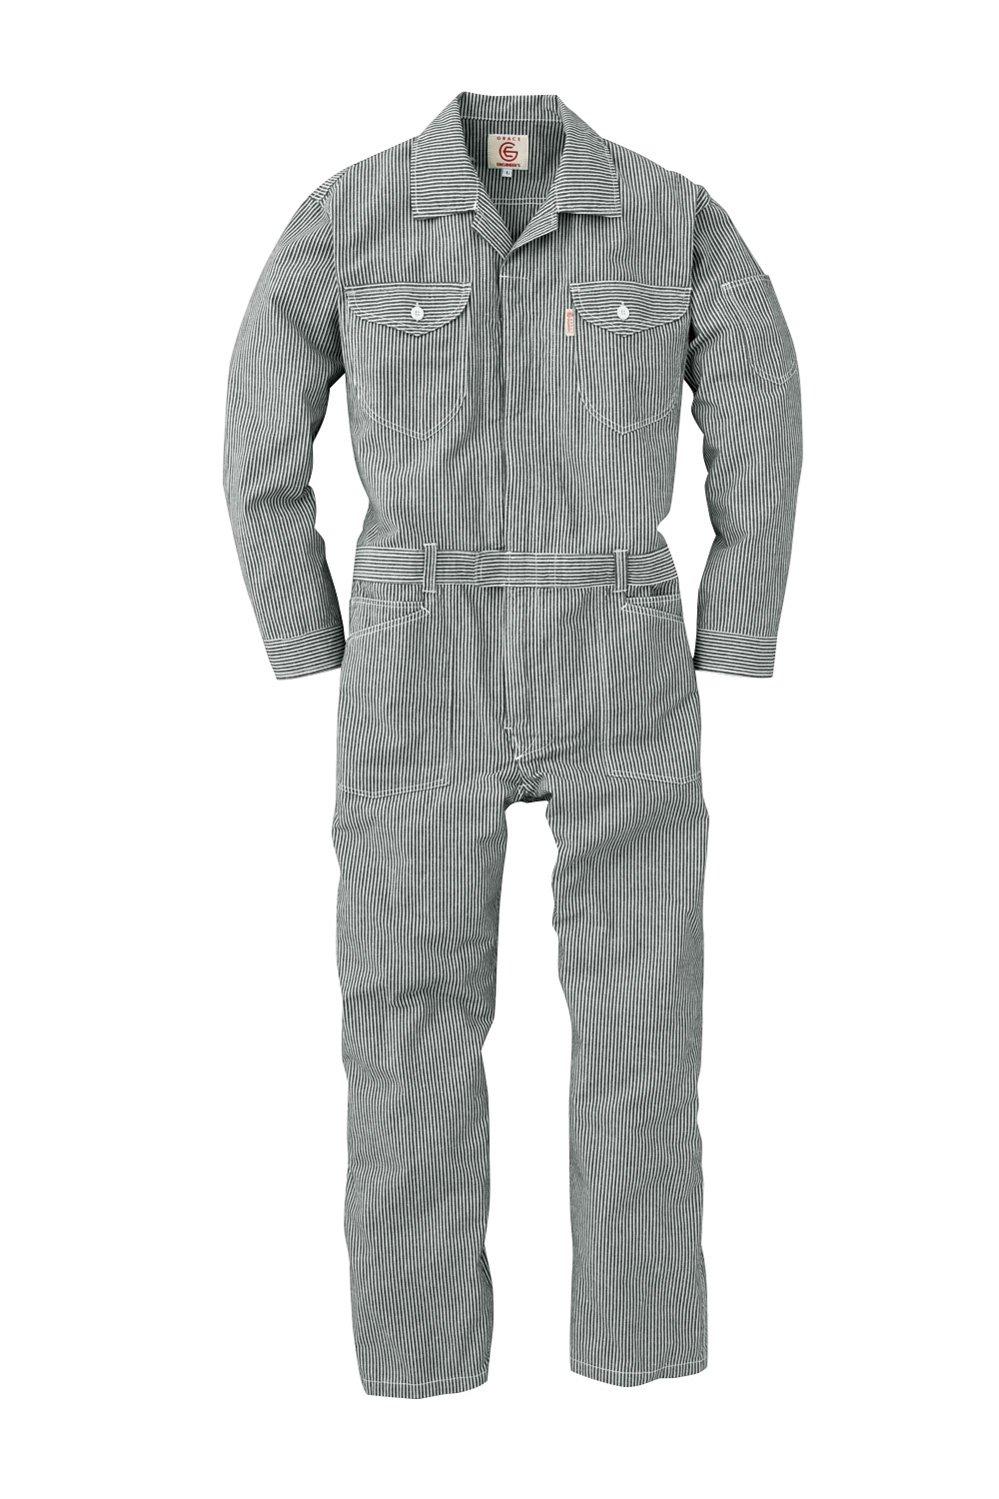 GRACE ENGINEERS GE928 20 ブラックヒッコリー 春夏用 長袖つなぎ L B00XSBNXAC ブラックヒッコリー L